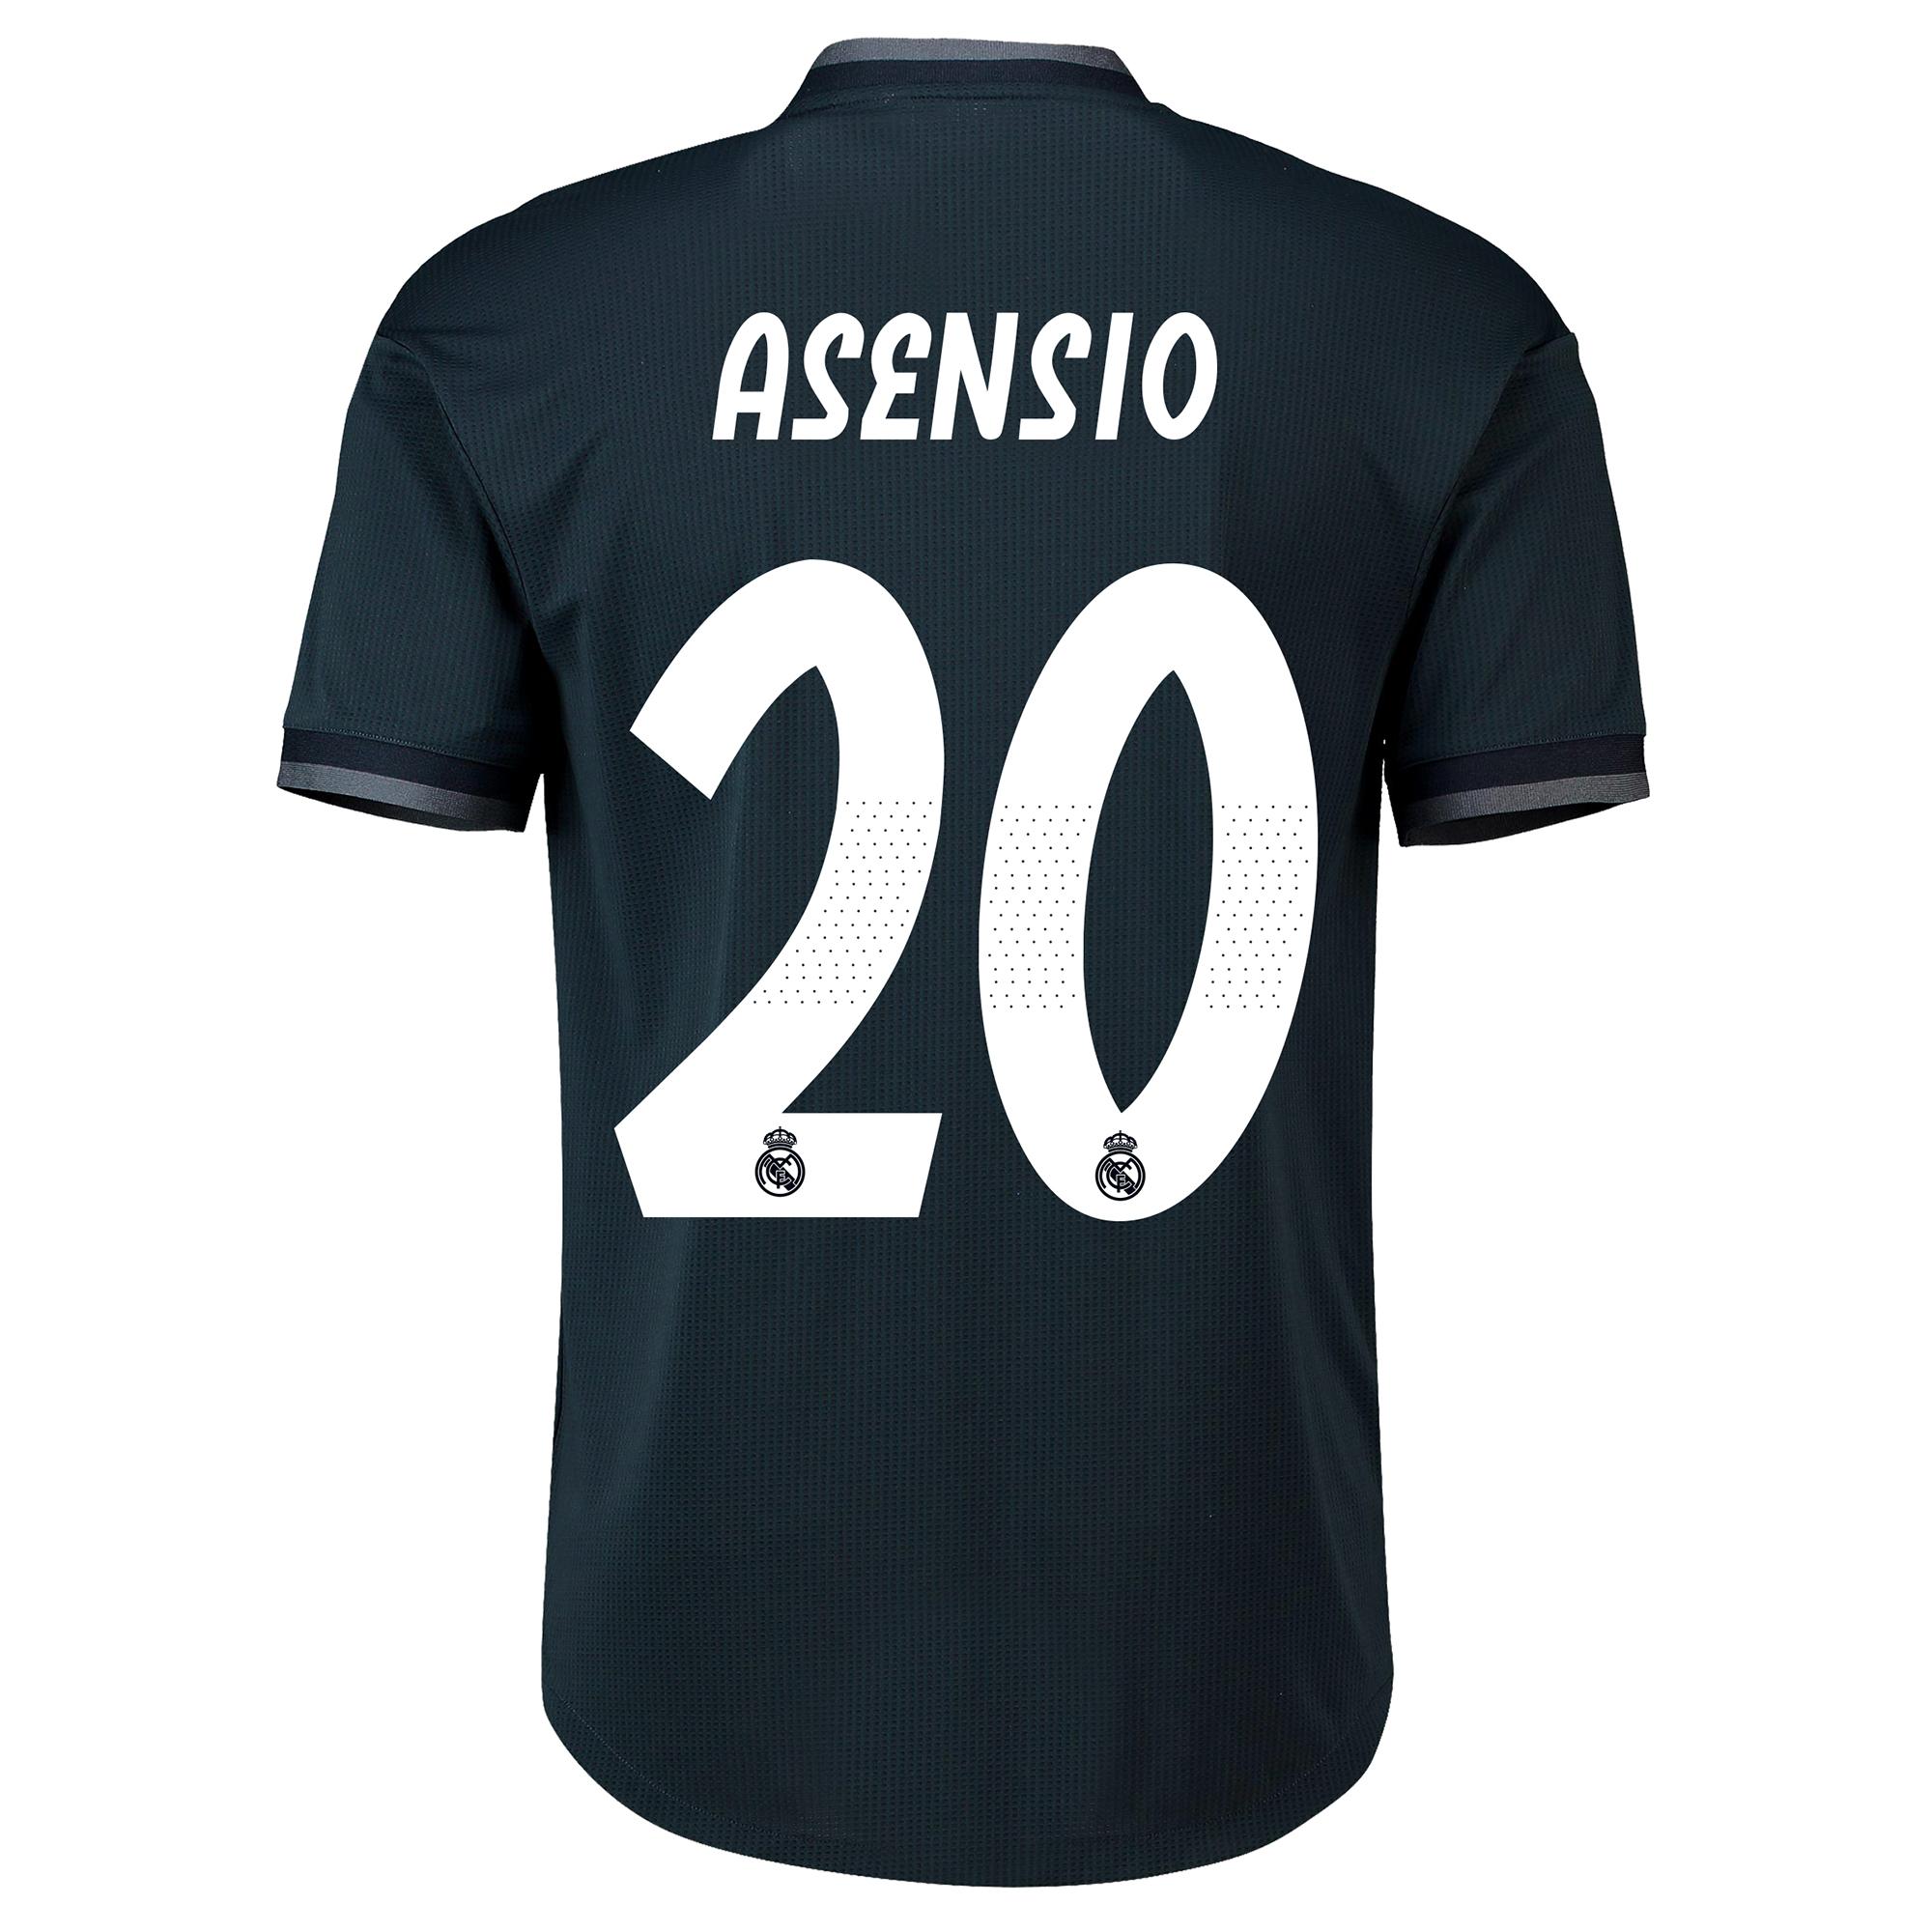 Image of Real Madrid Away Adi Zero Shirt 2018-19 with Asensio 20 printing